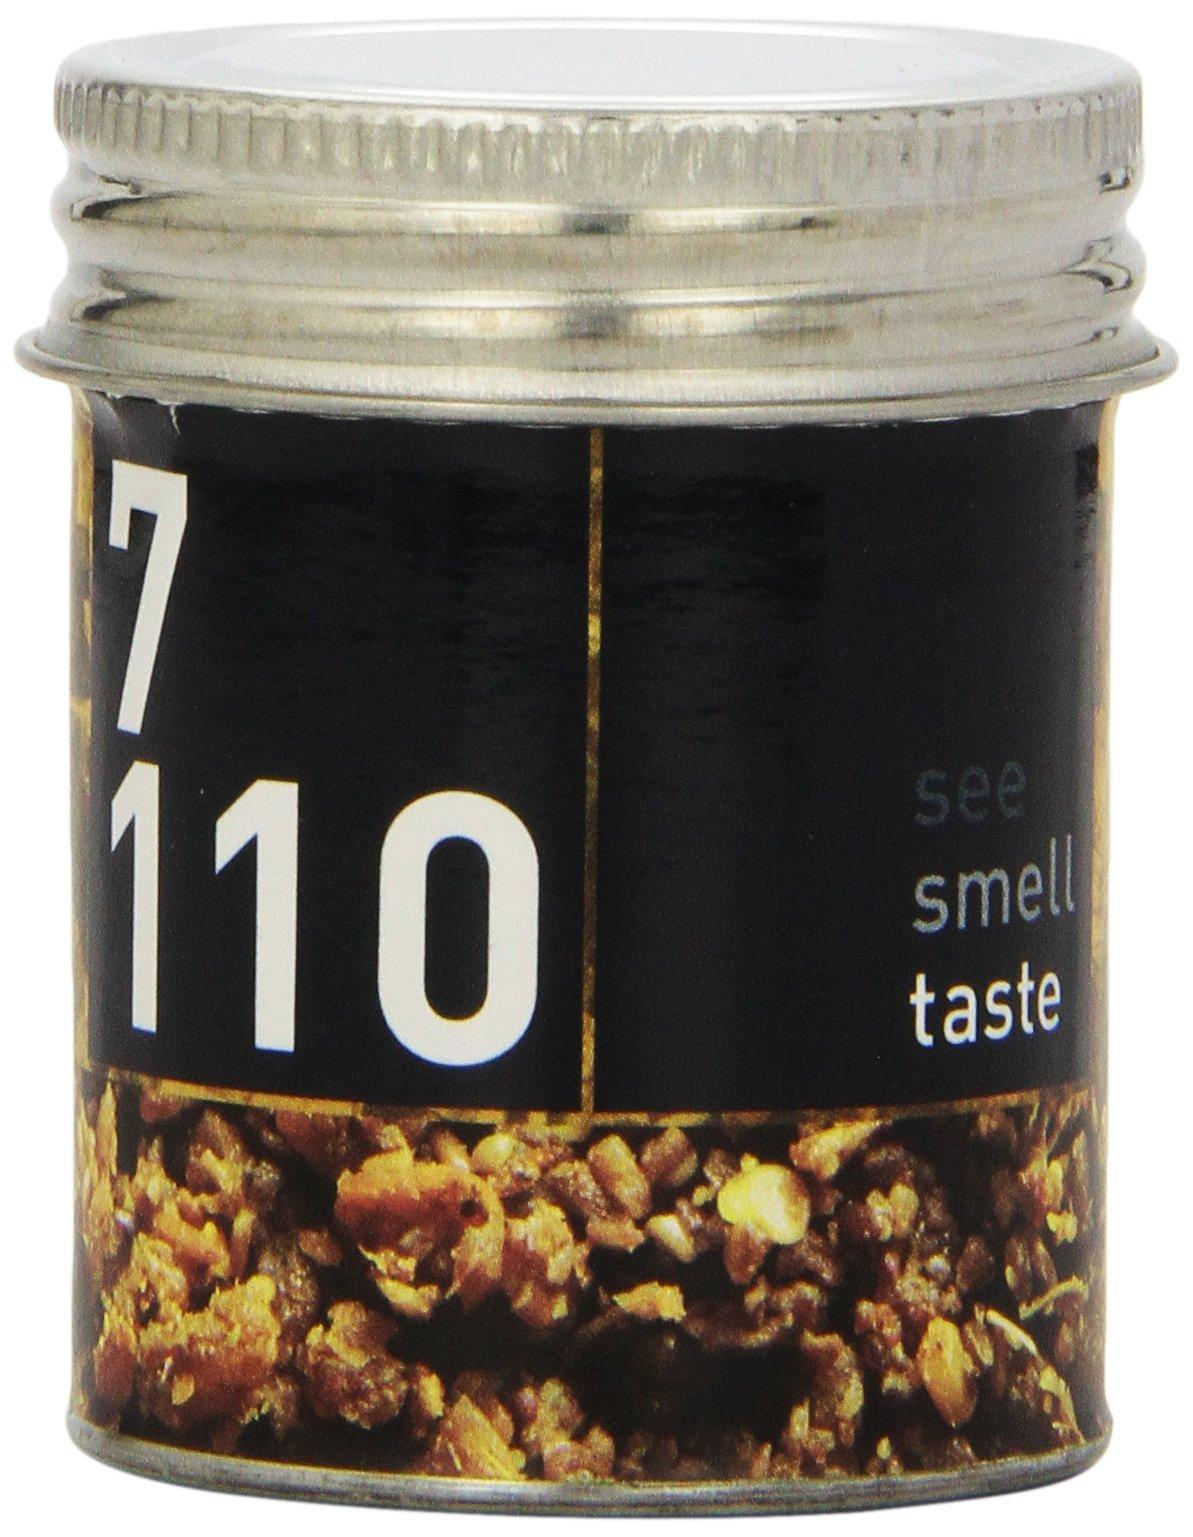 See Smell Taste Vadouvan Golden, 0.8-Ounce Jars (Pack of 2)